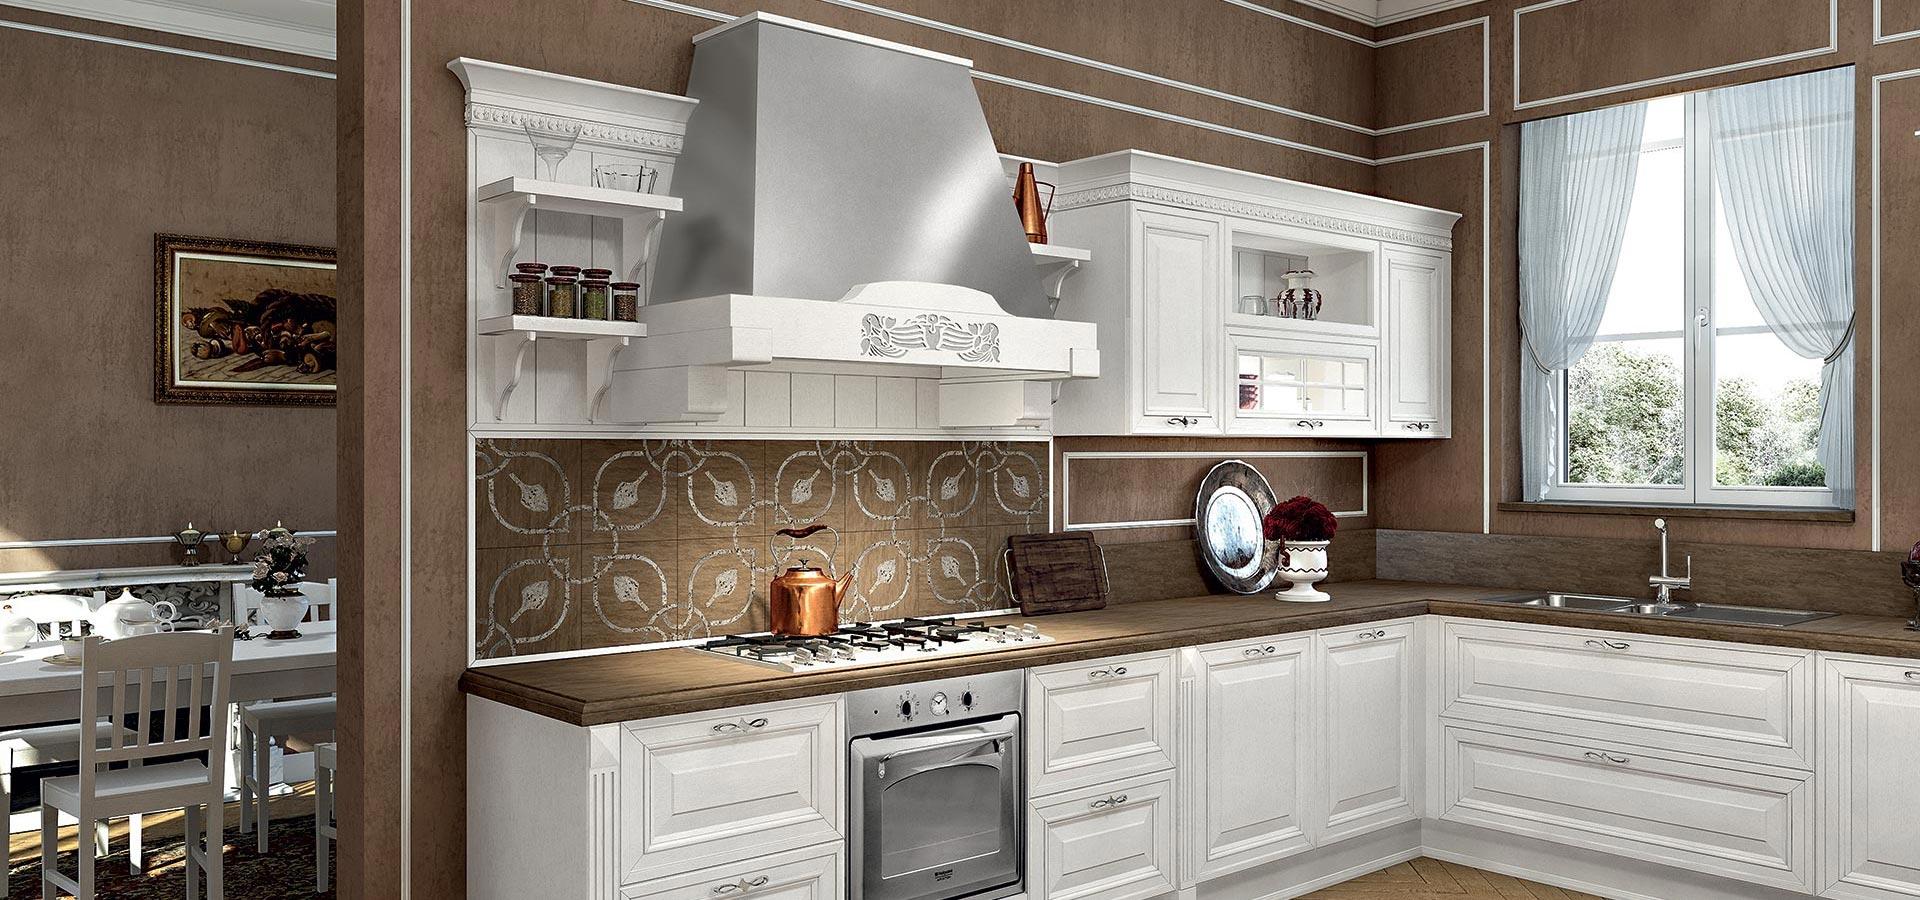 Cucine in stile provenzale cucina shabby chic in stile - Cucine provenzali francesi ...